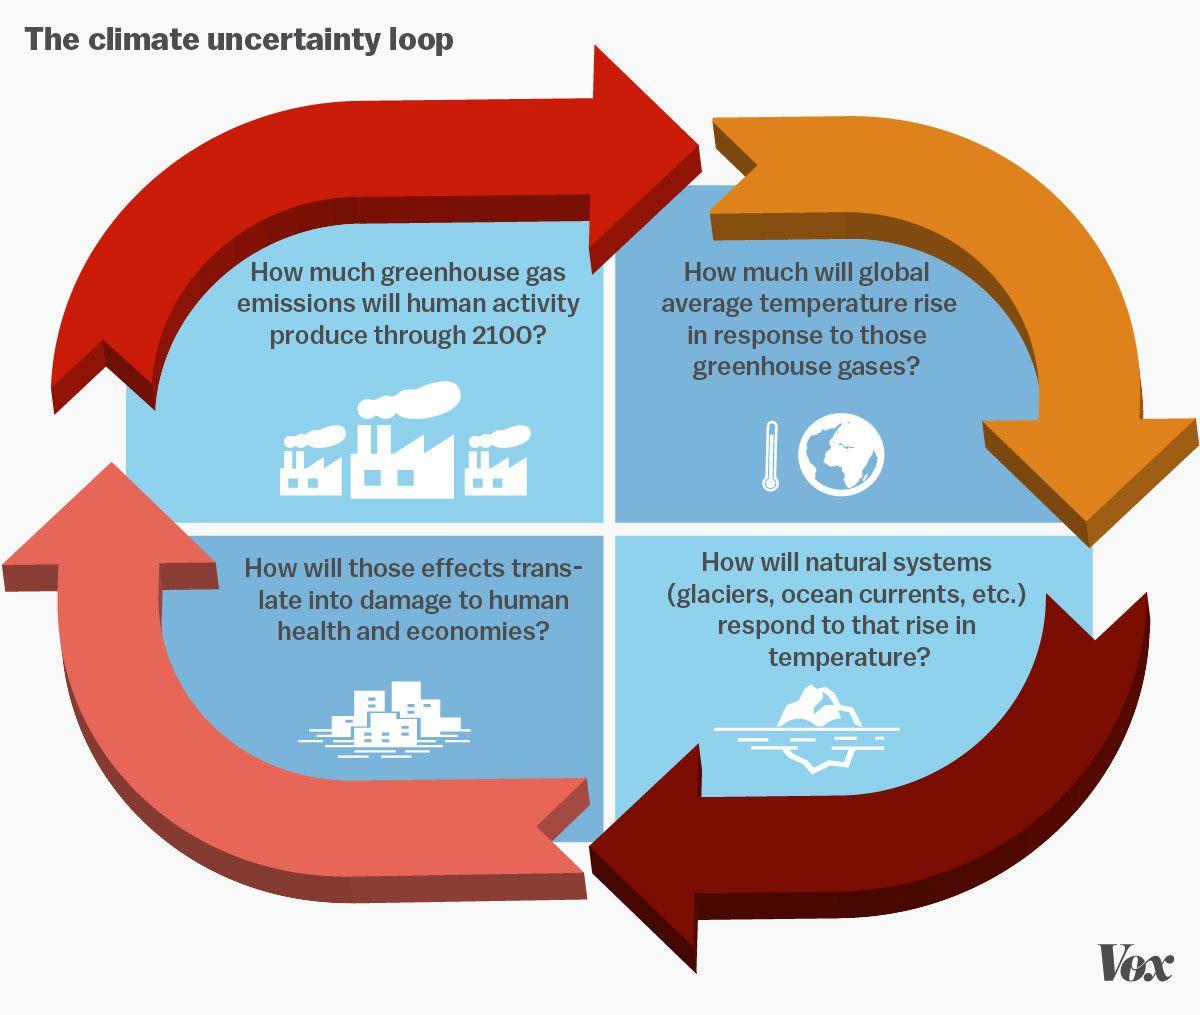 climate change uncertainty loop